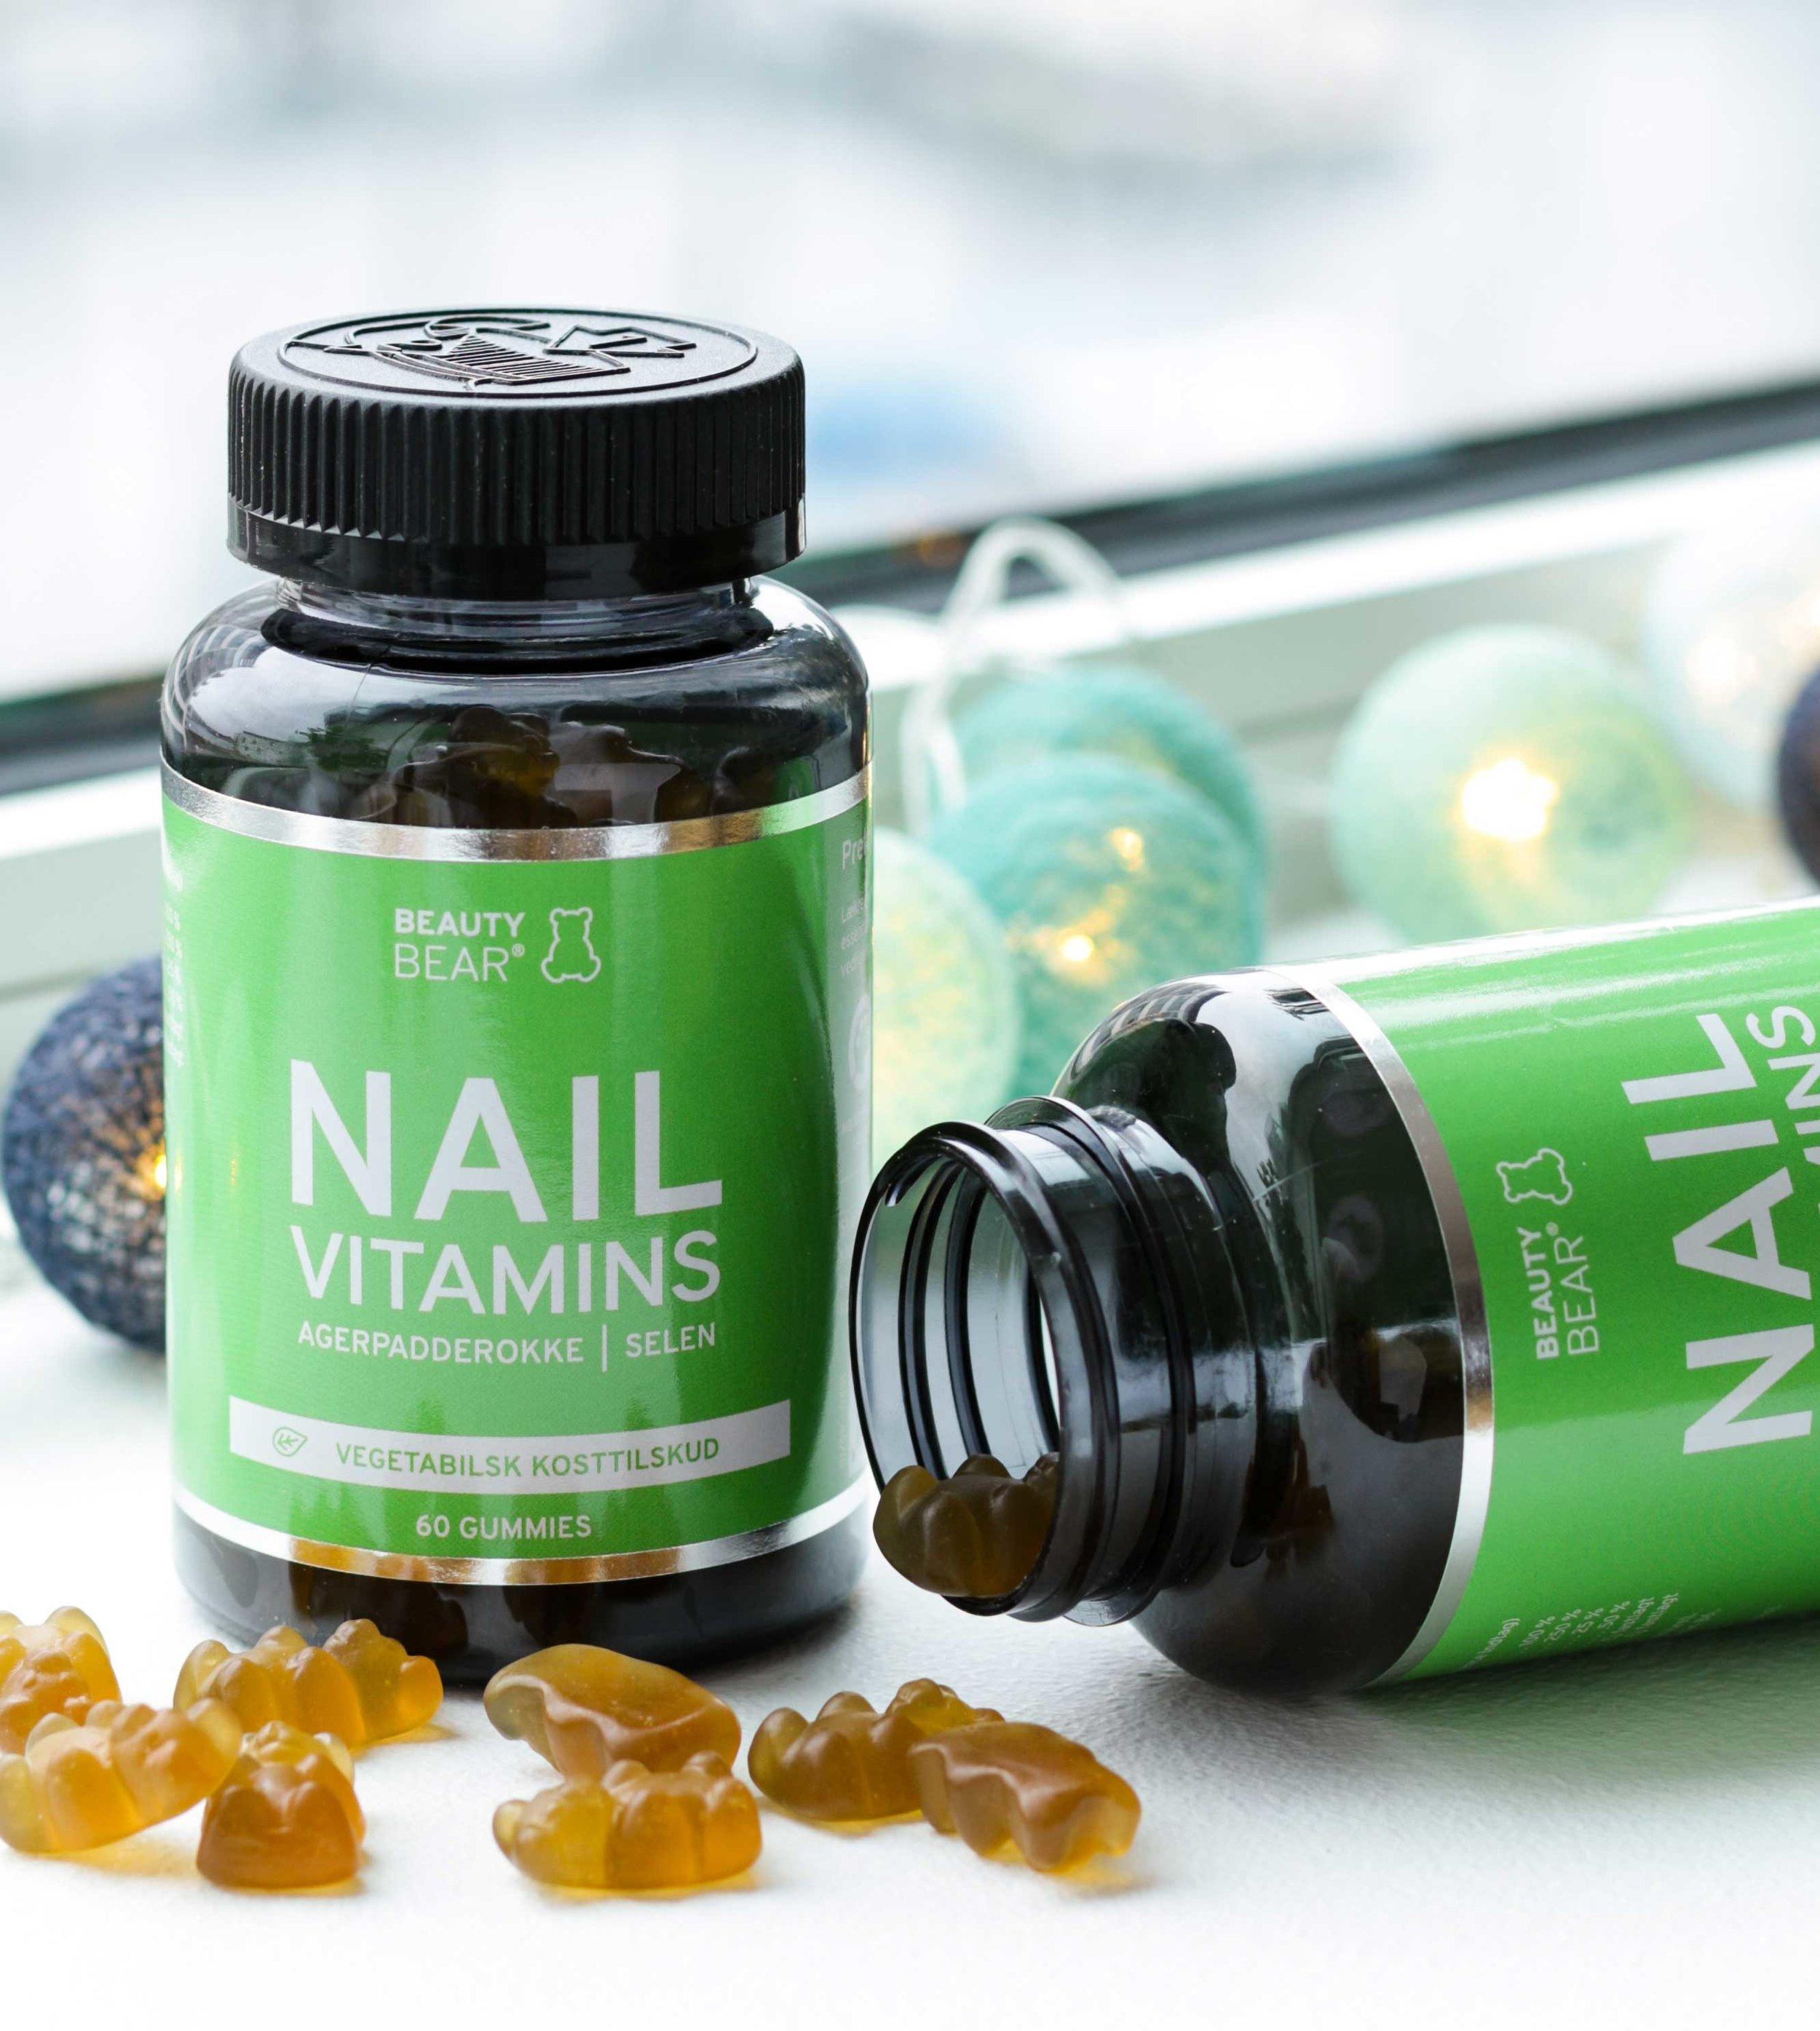 coverbrands_nail_negler_vitaminer_beauty_bears_hair.jpg